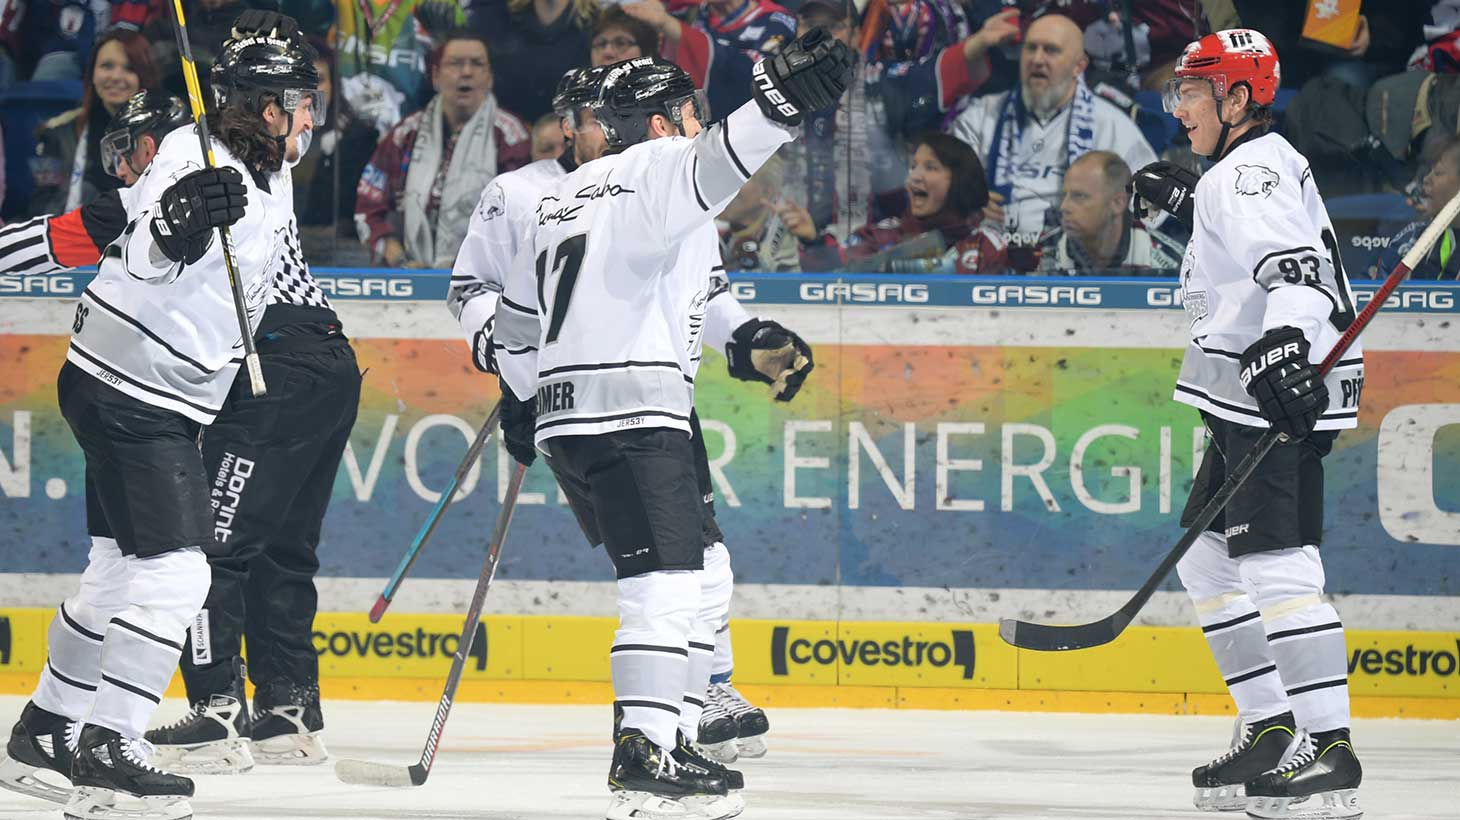 52 Ice Tigers Gewinnen Auch In Berlin Thomas Sabo Ice Tigers